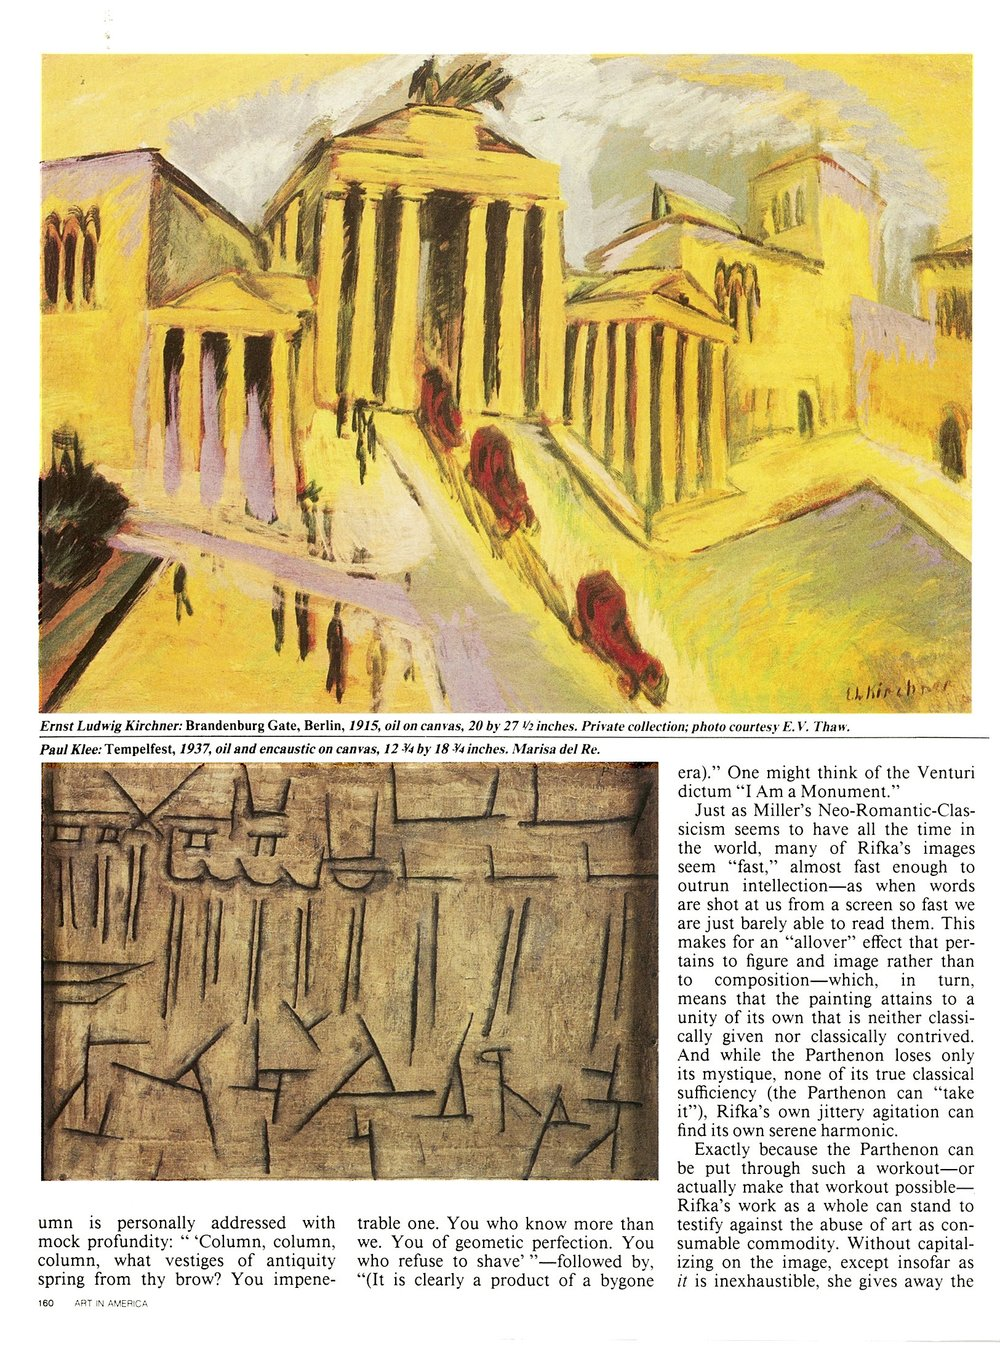 ART_IN_AMERICA_RIFKA_Page_14.jpg